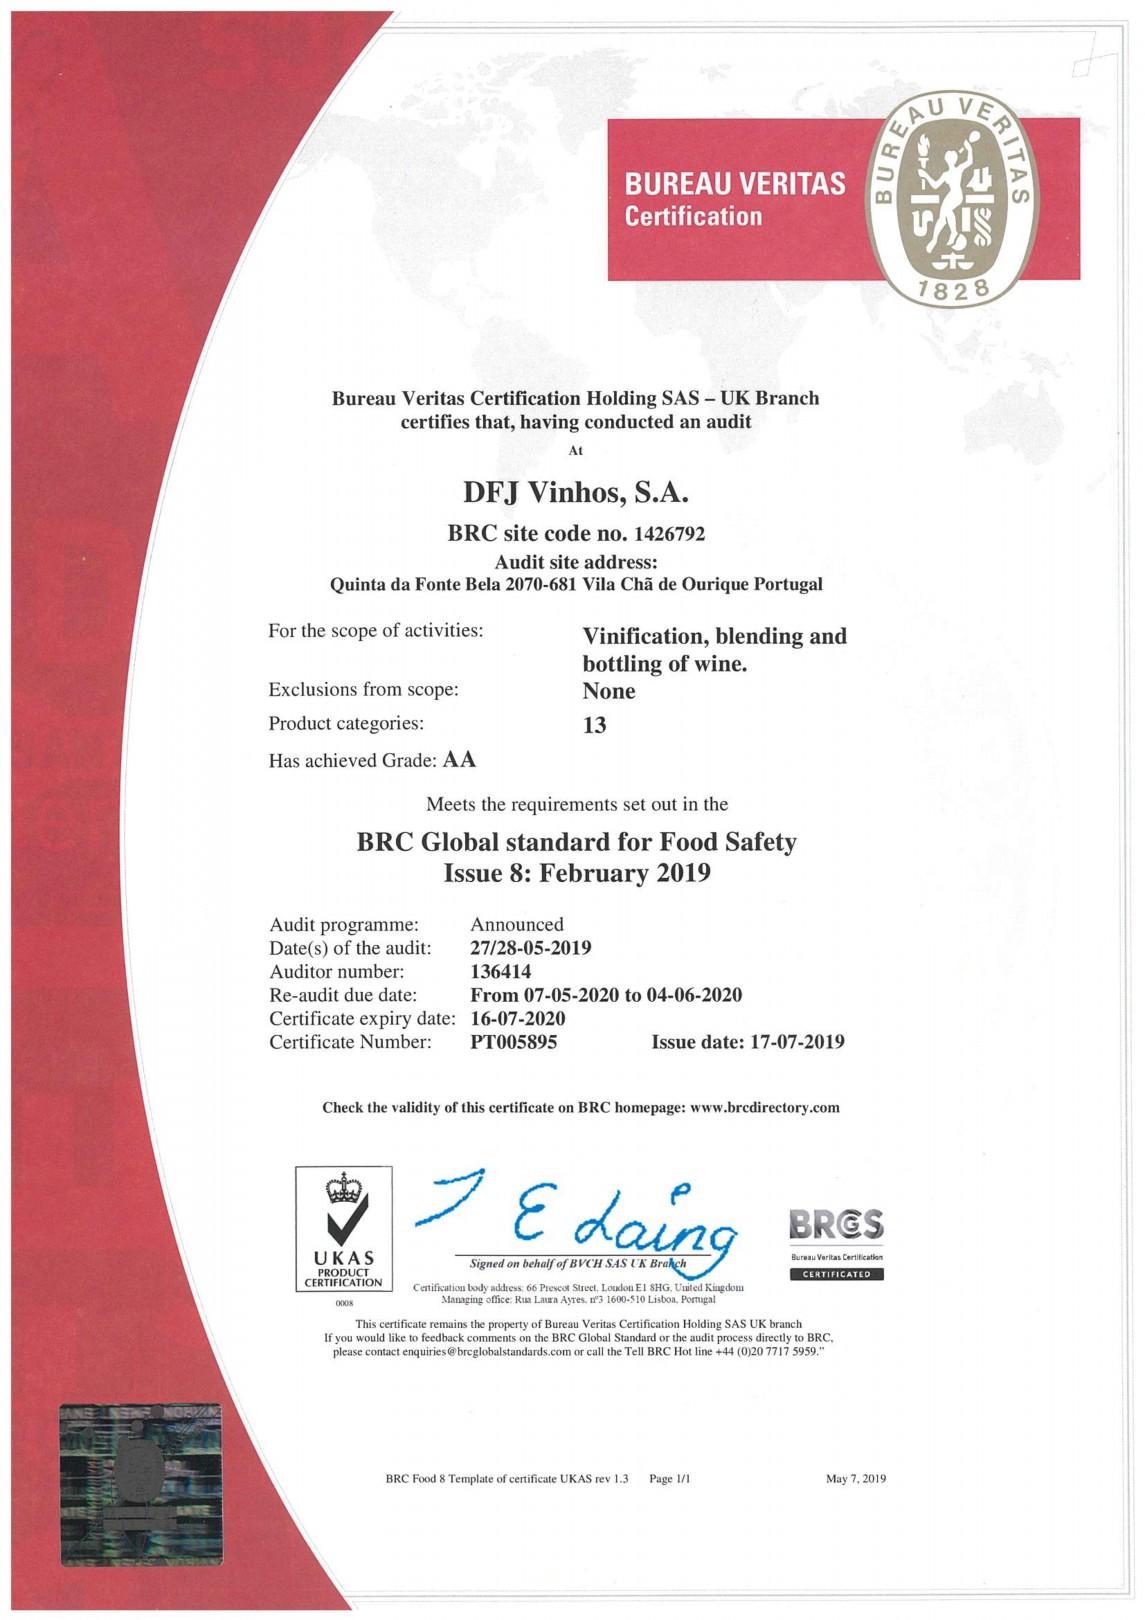 brc certificate certification dfj vinhos pdf 4kb dfjvinhos